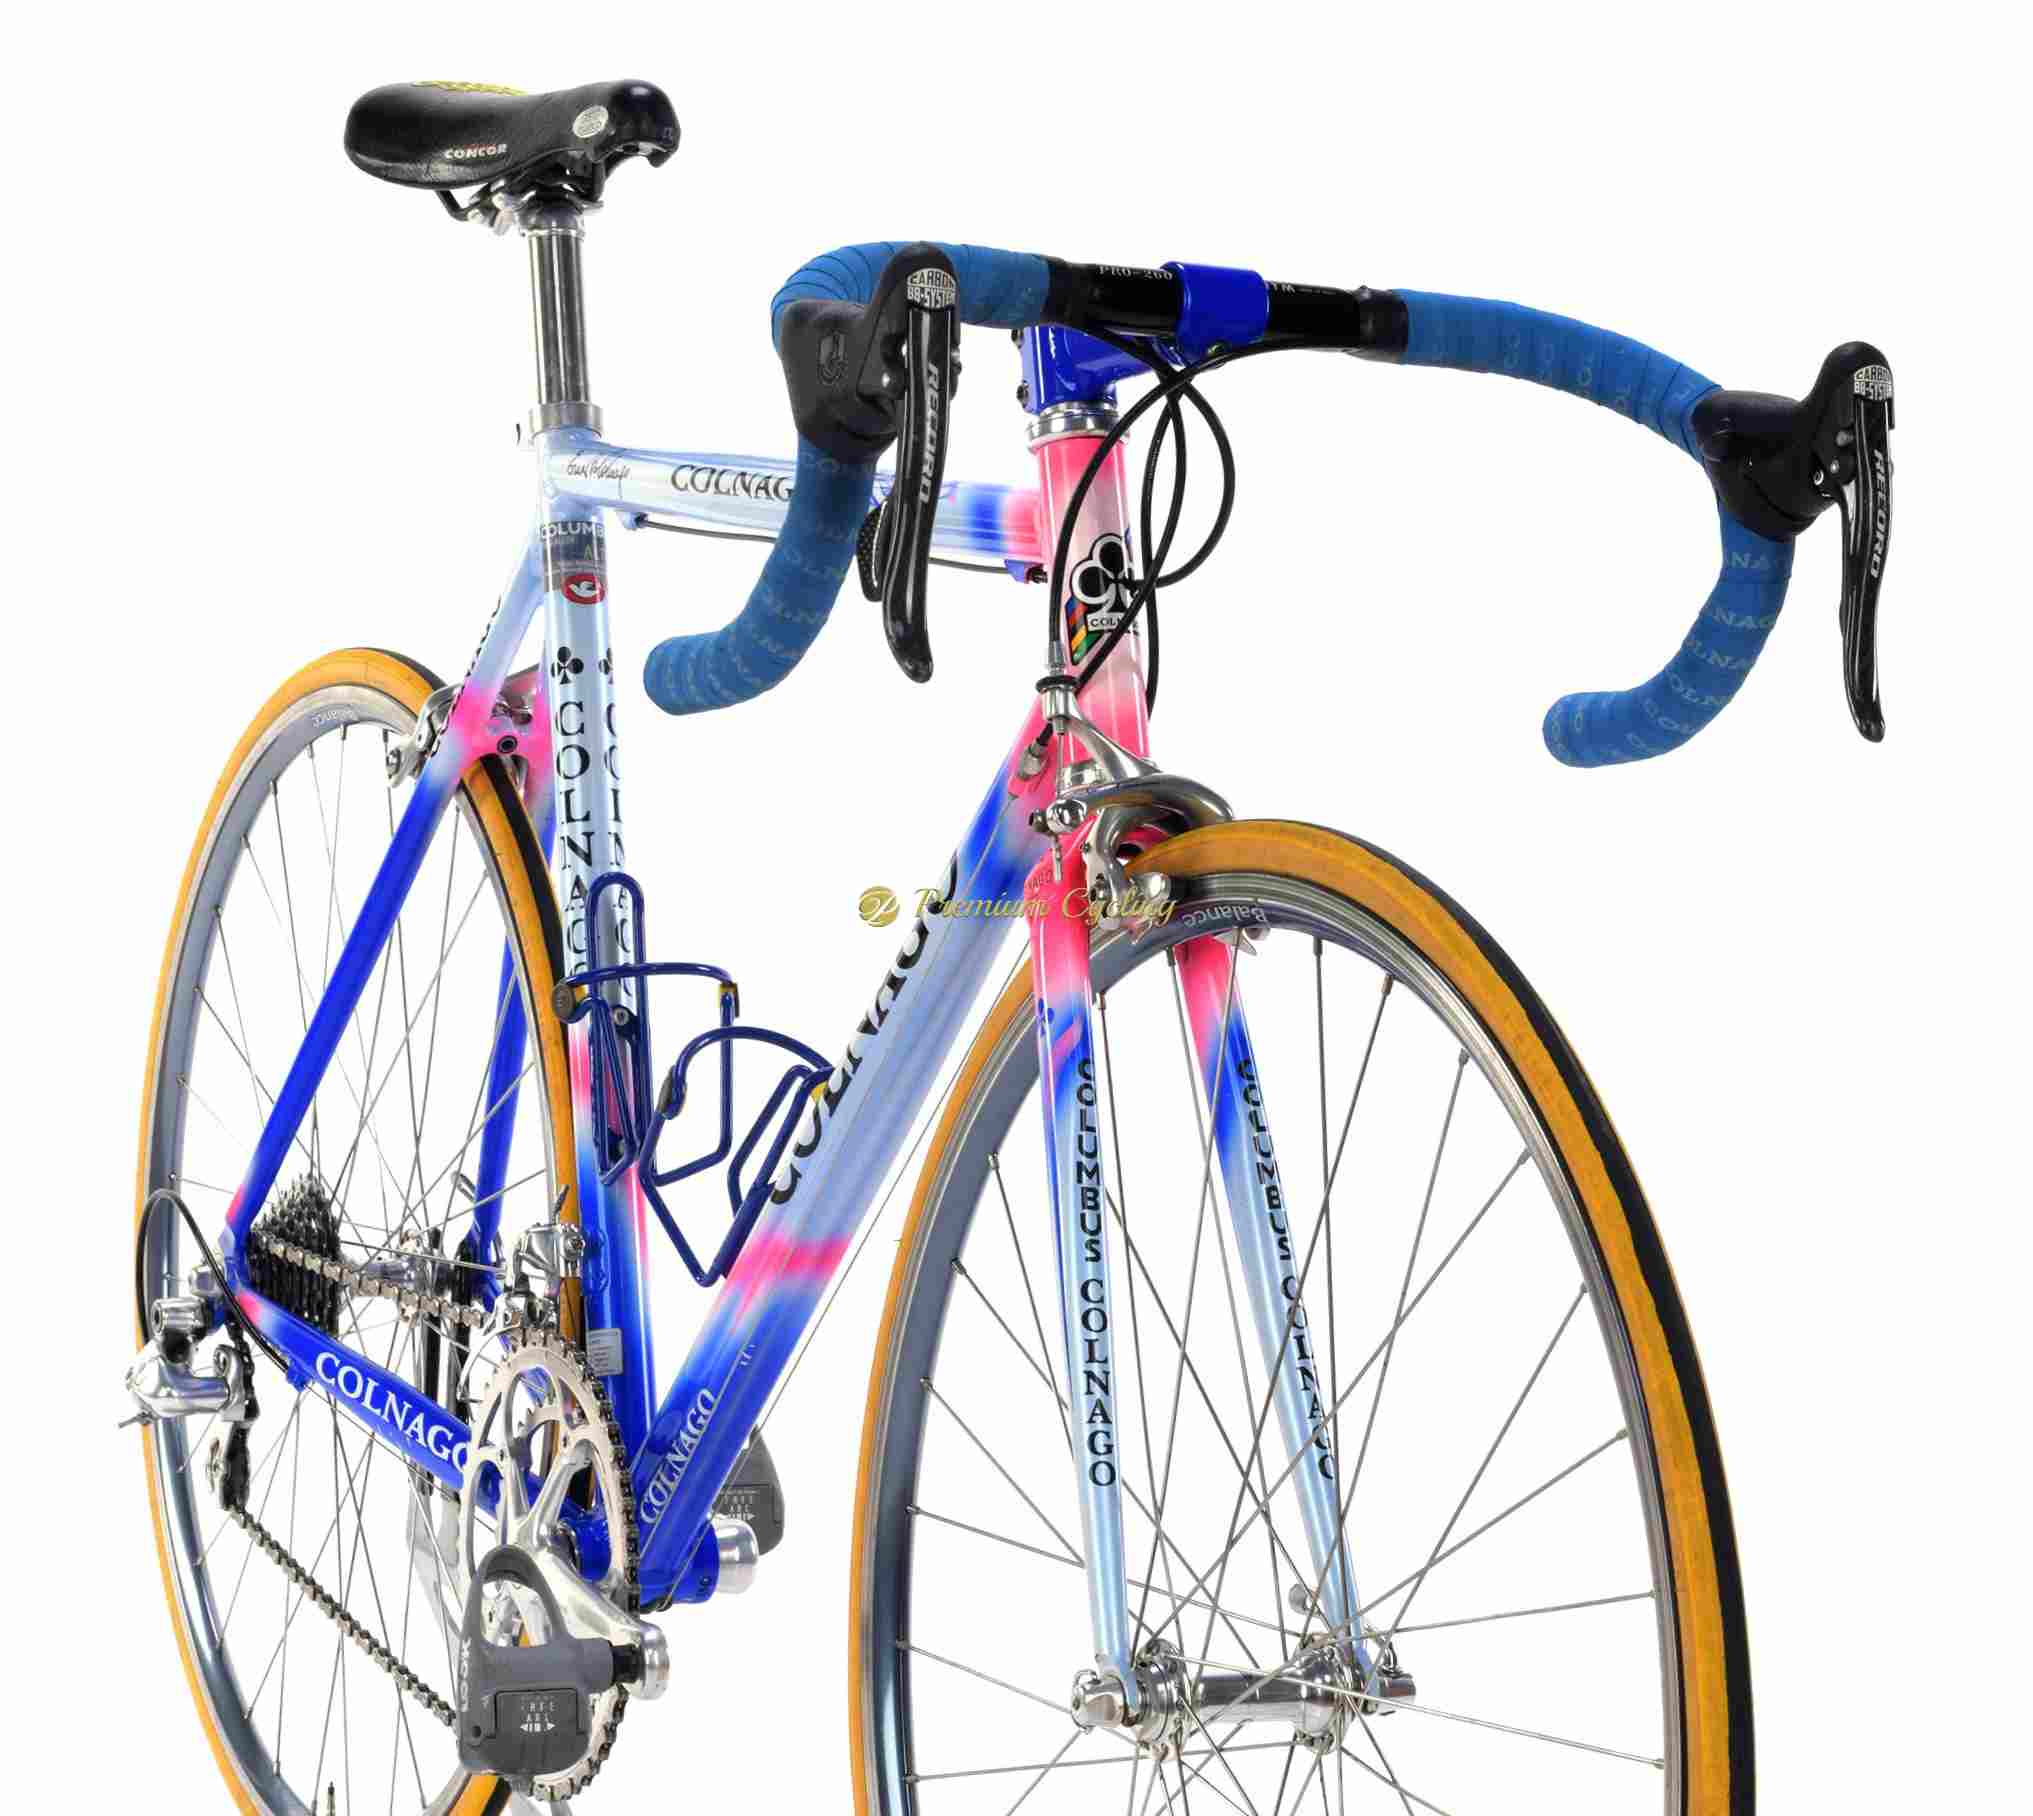 New White Colnago Road Bike Handlebar Cork Tape